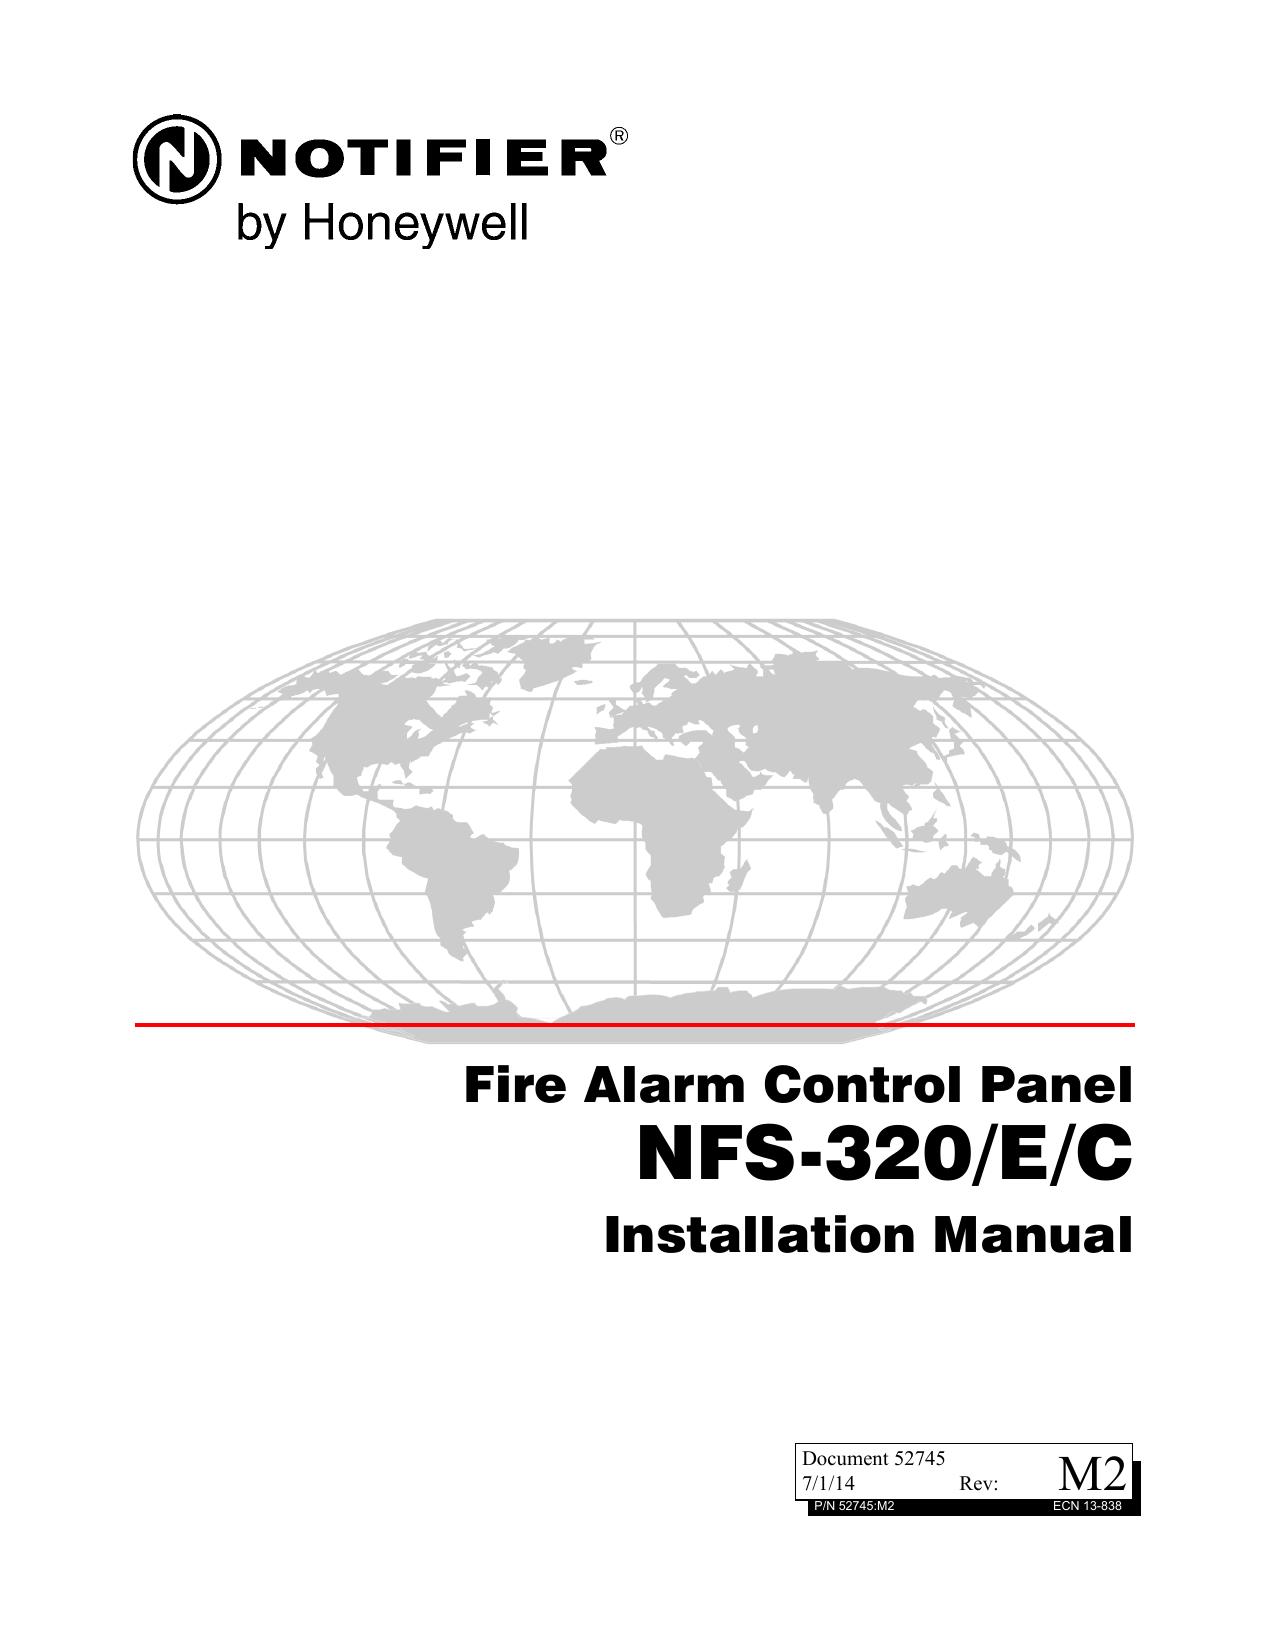 nfs 320 e c fps fire protection systems manualzz com